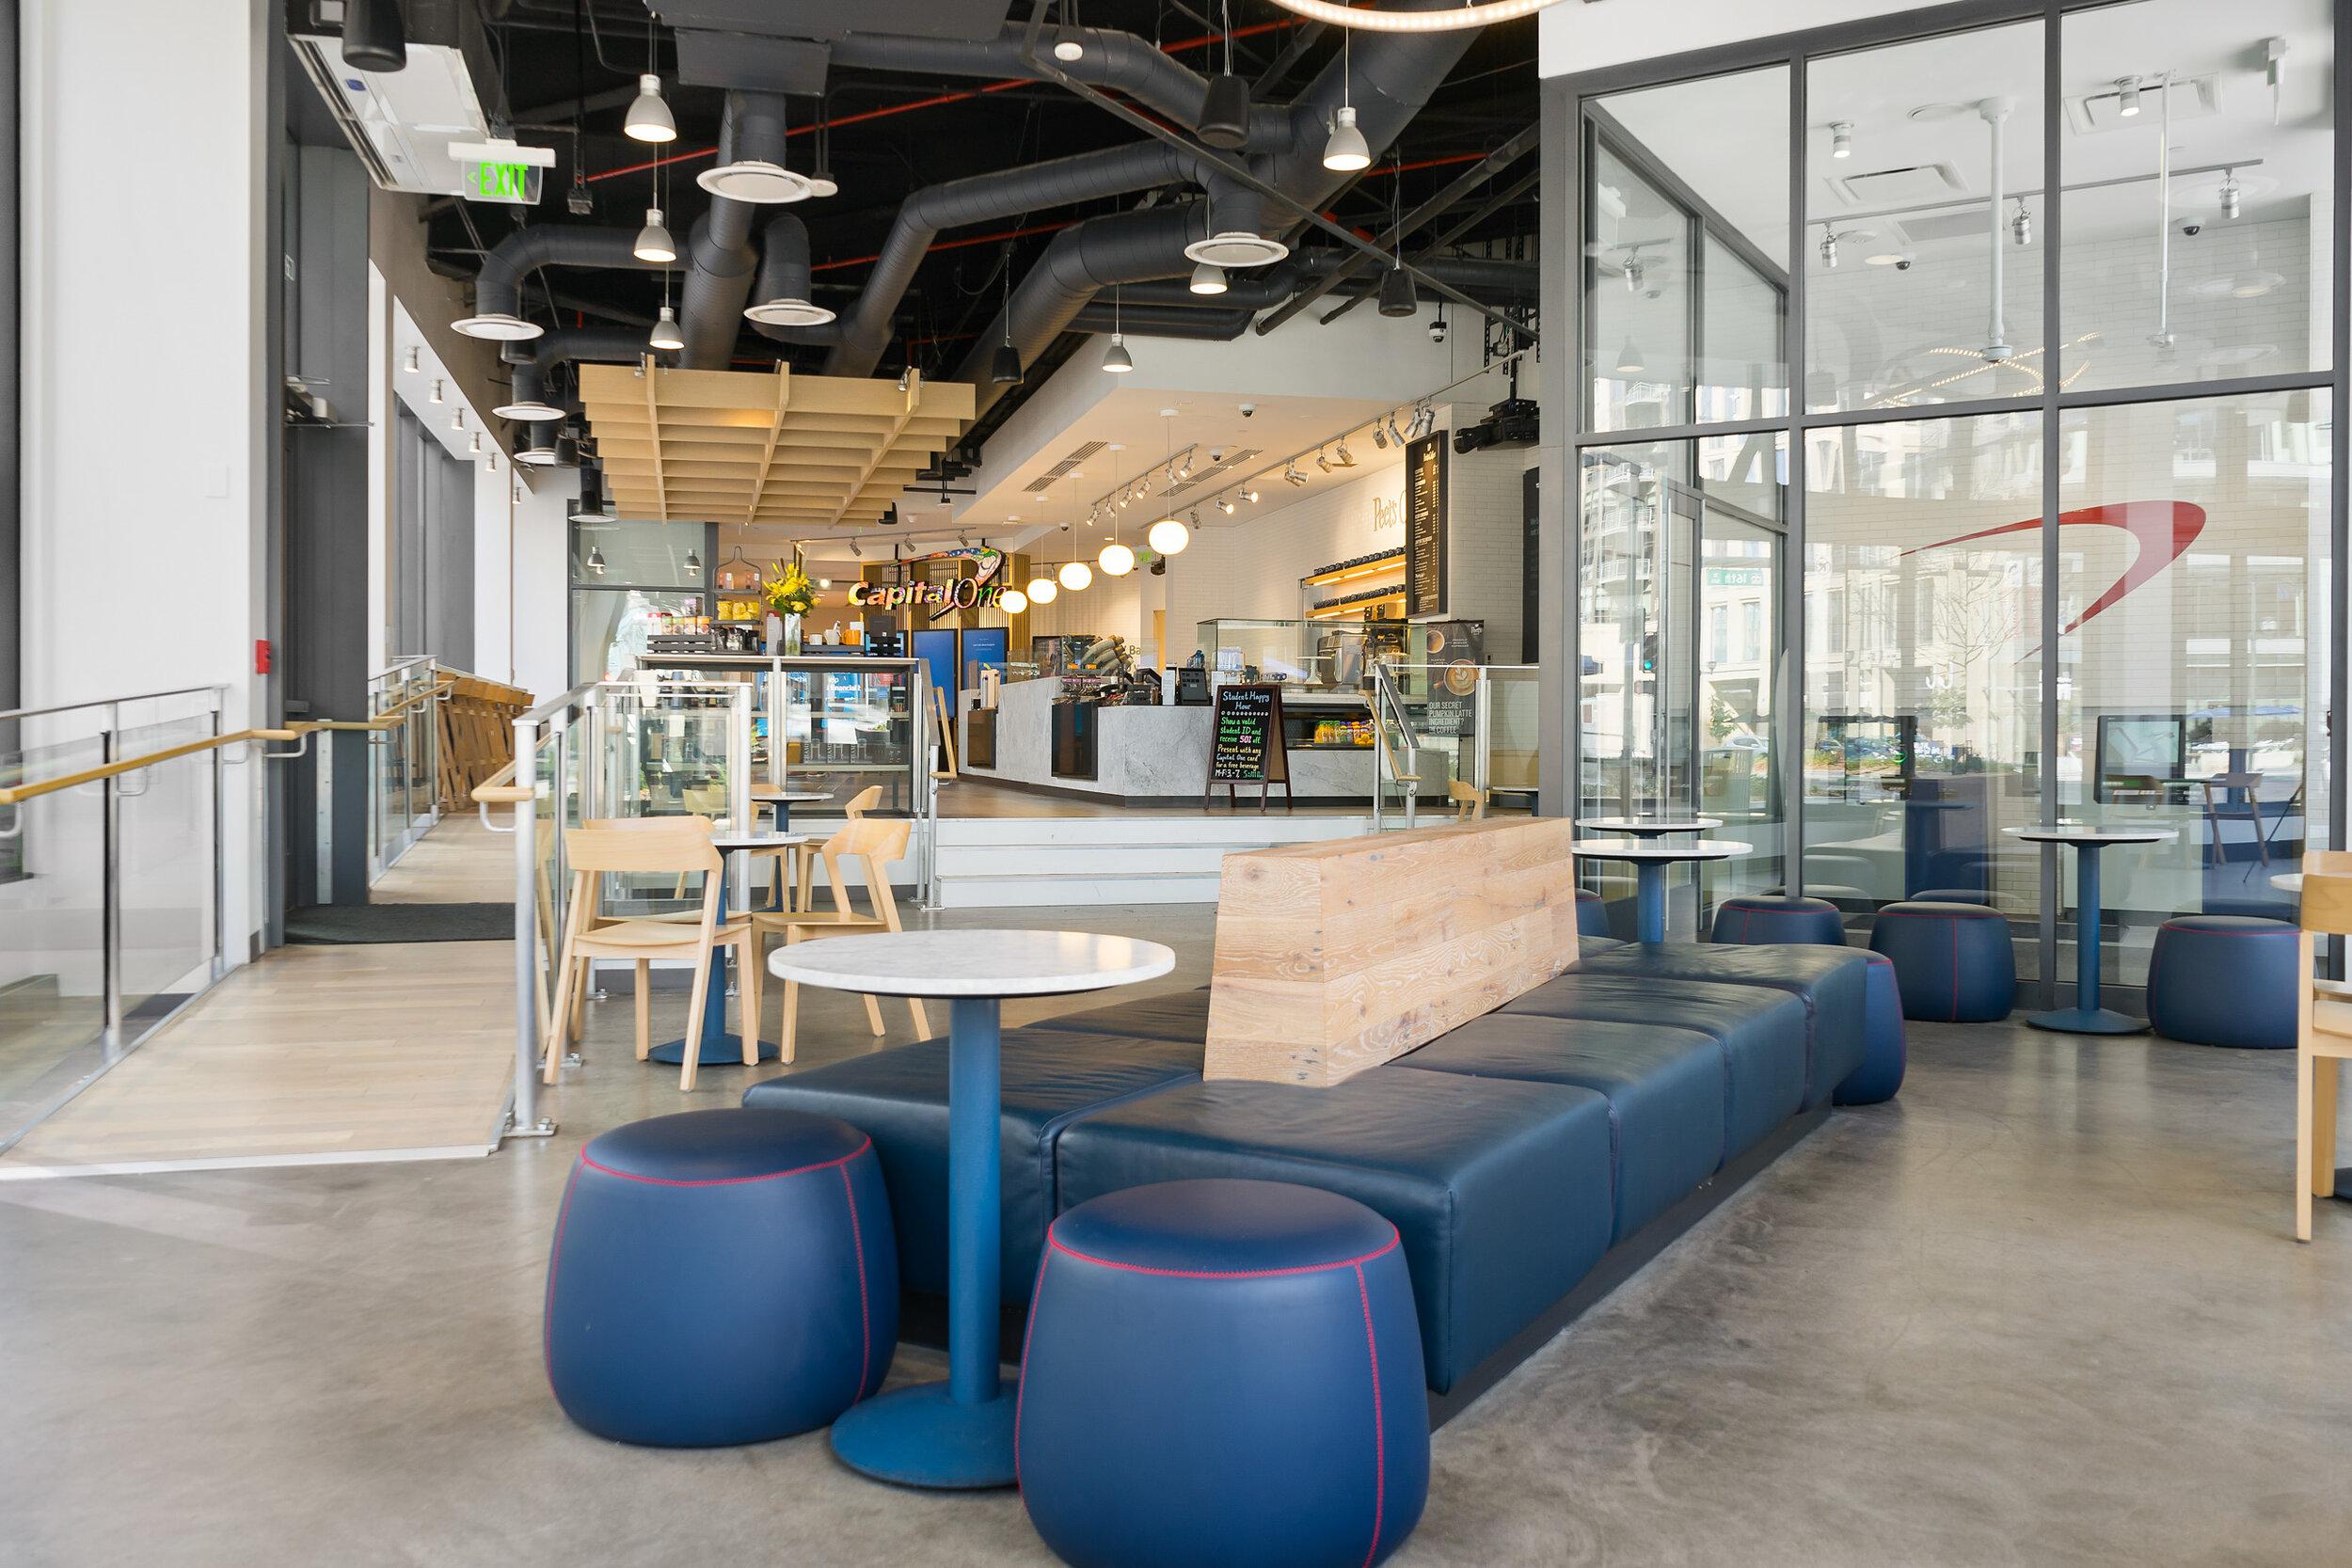 031-1550-Wewatta-St-Capital-One-Cafe-MLS.jpg